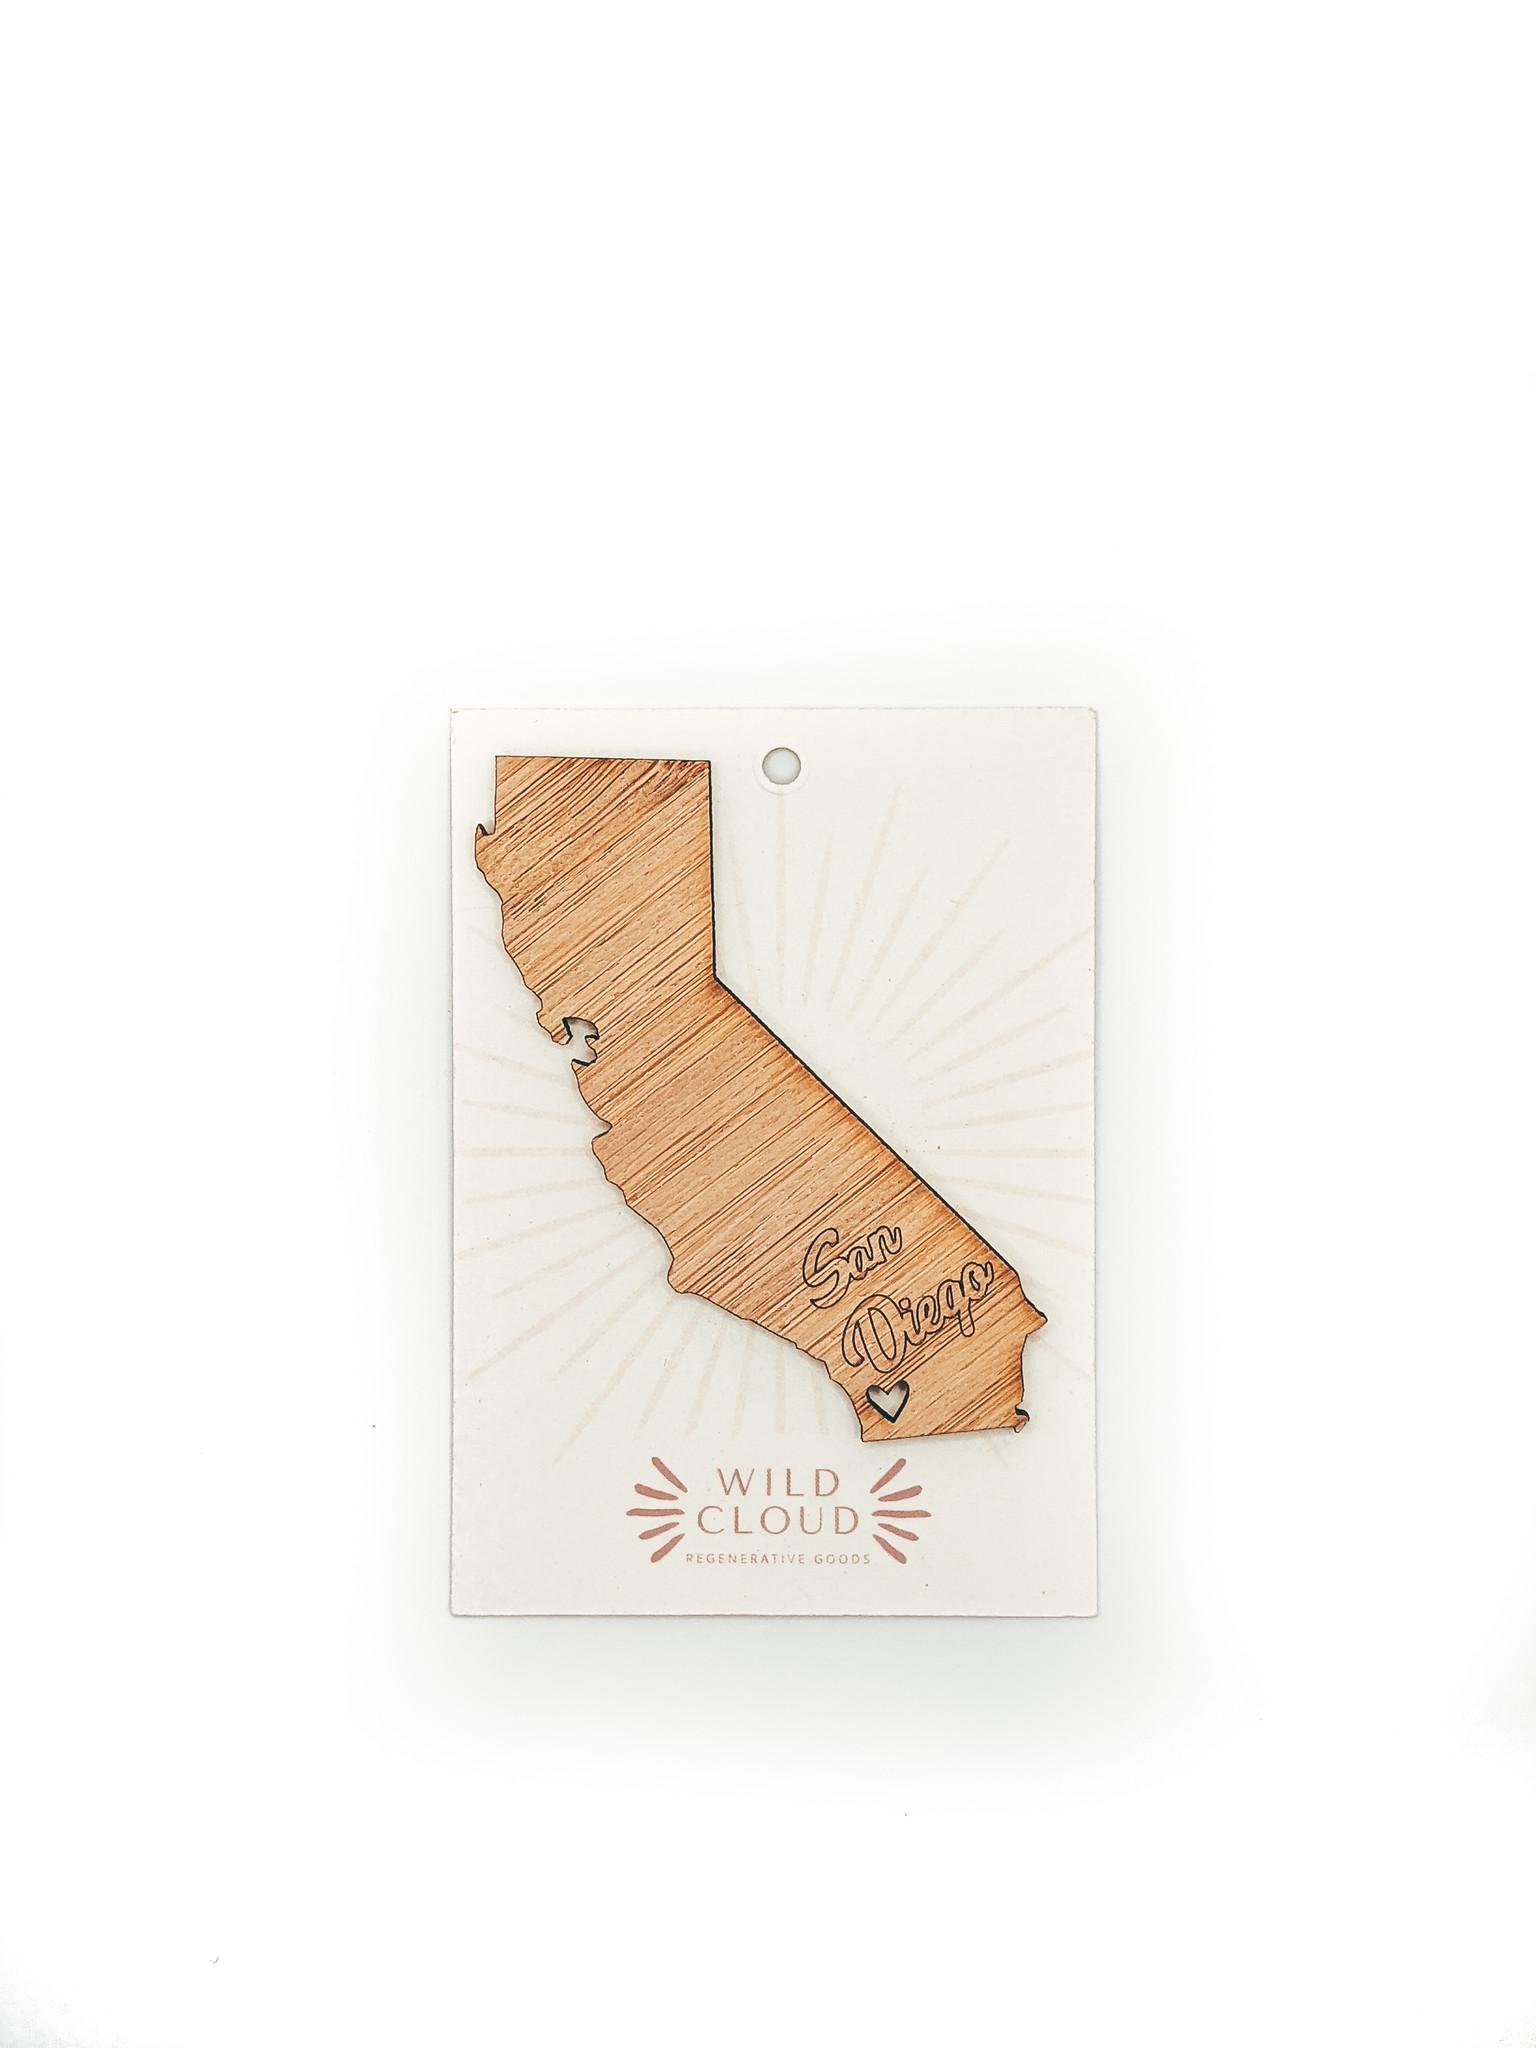 wild cloud san diego magnet, california state, bamboo